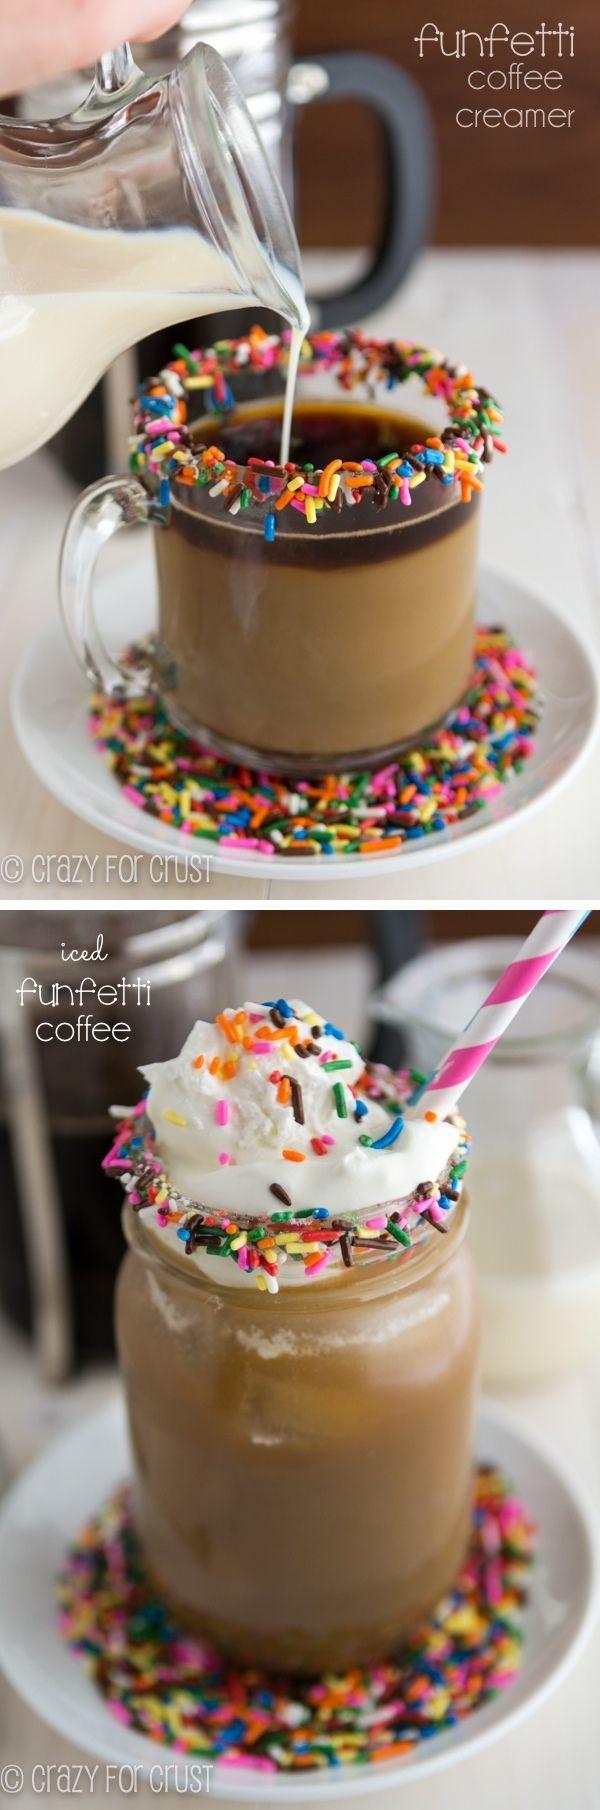 Hot or iced, Funfetti Coffee Creamer makes coffee taste like cake!